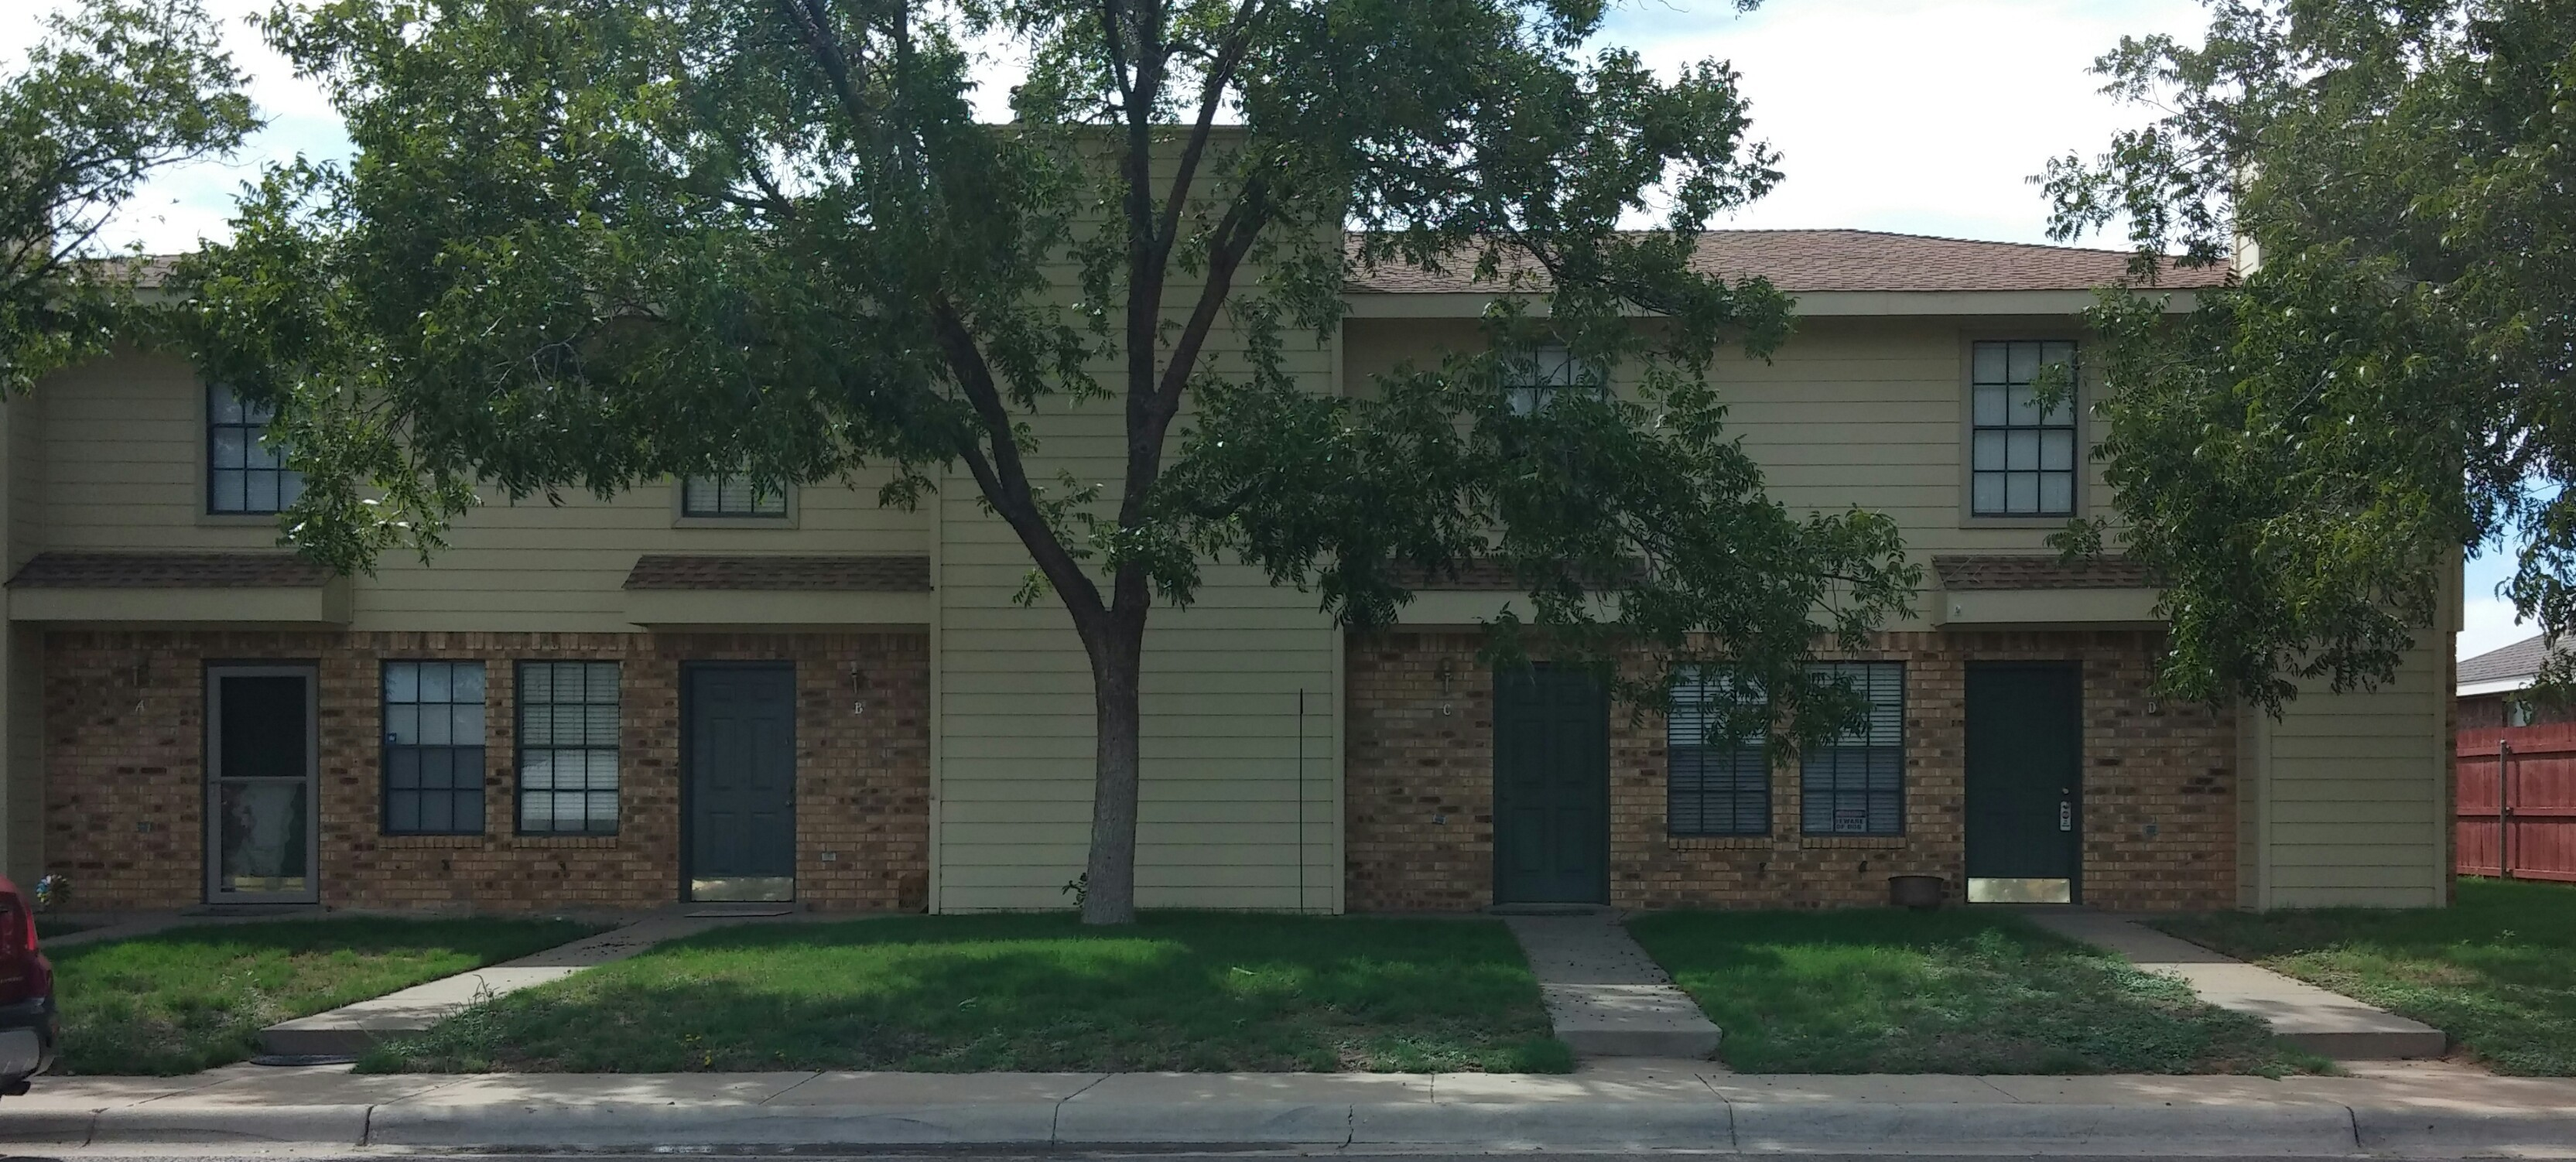 Bradford - 4715 W Wadley Ave, Midland, TX 79707 - Apartment Rental ...